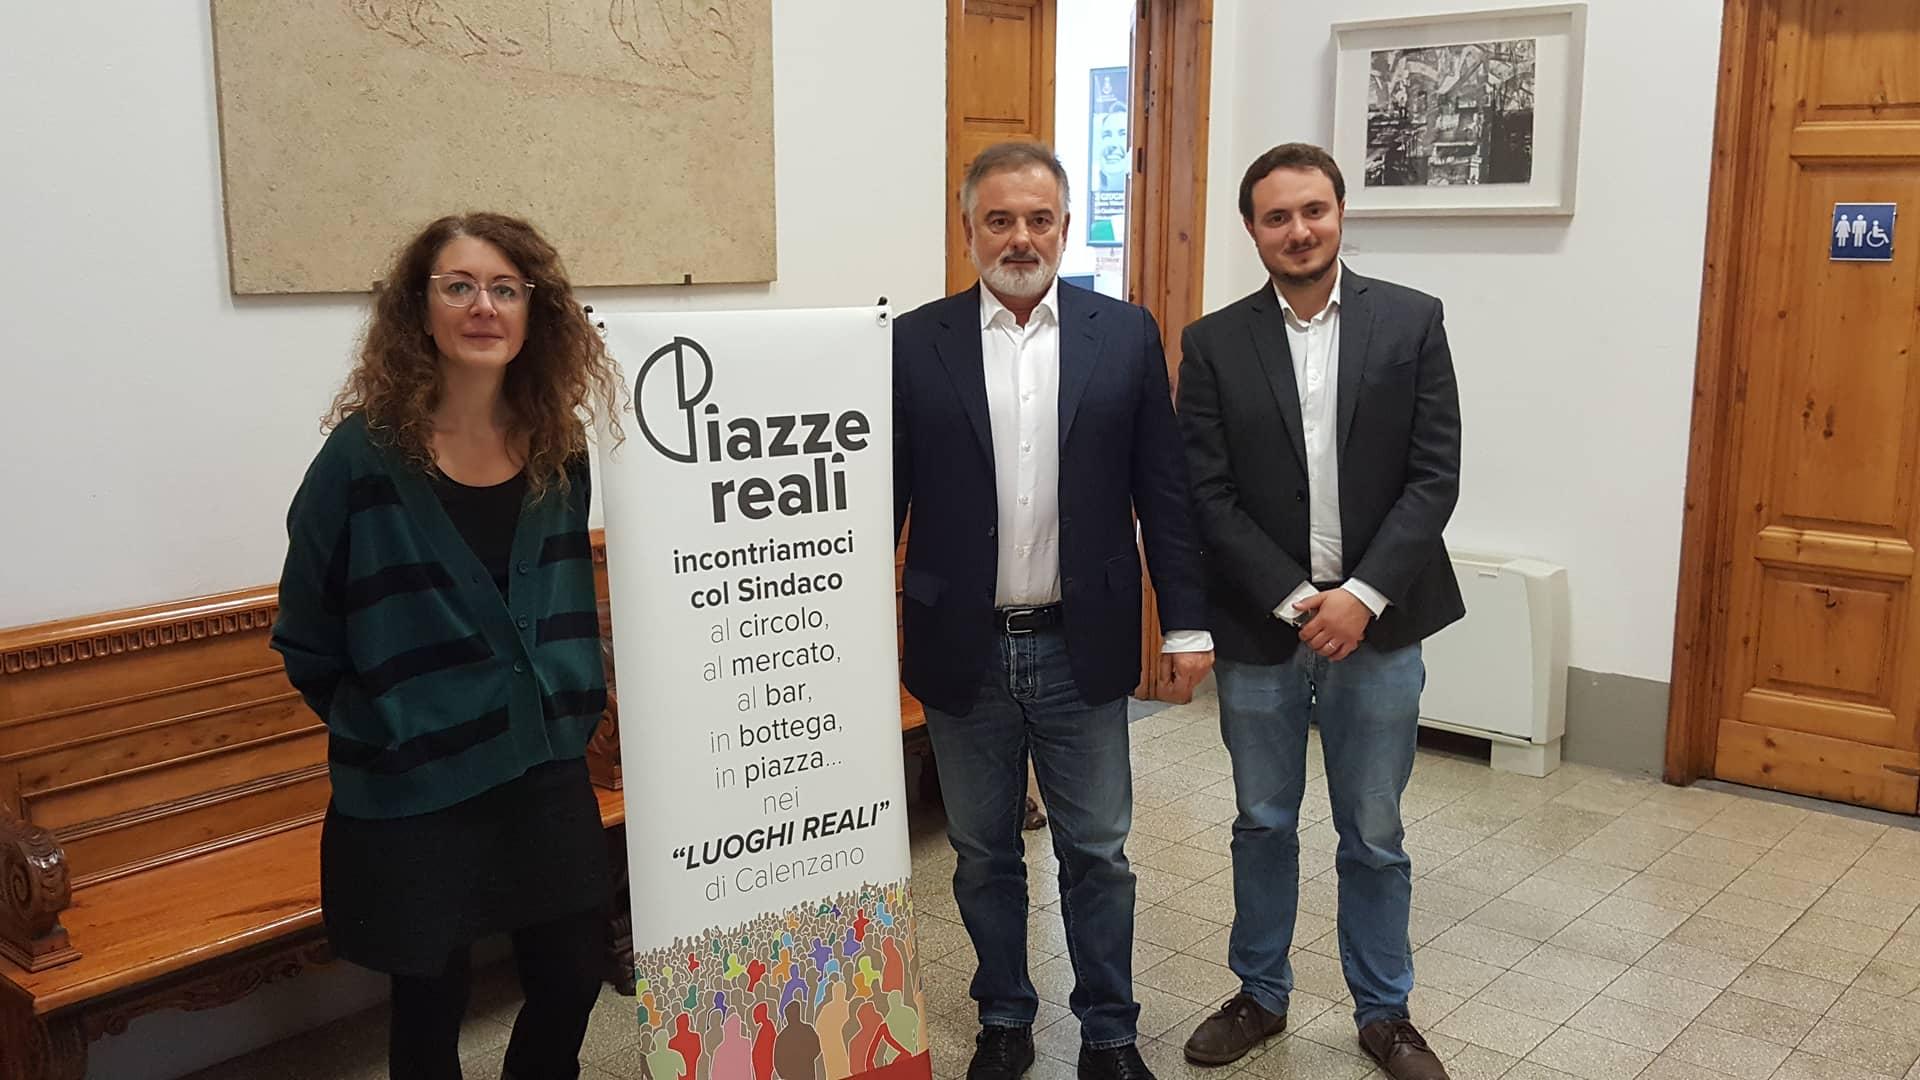 Calenzano - Piazze reali